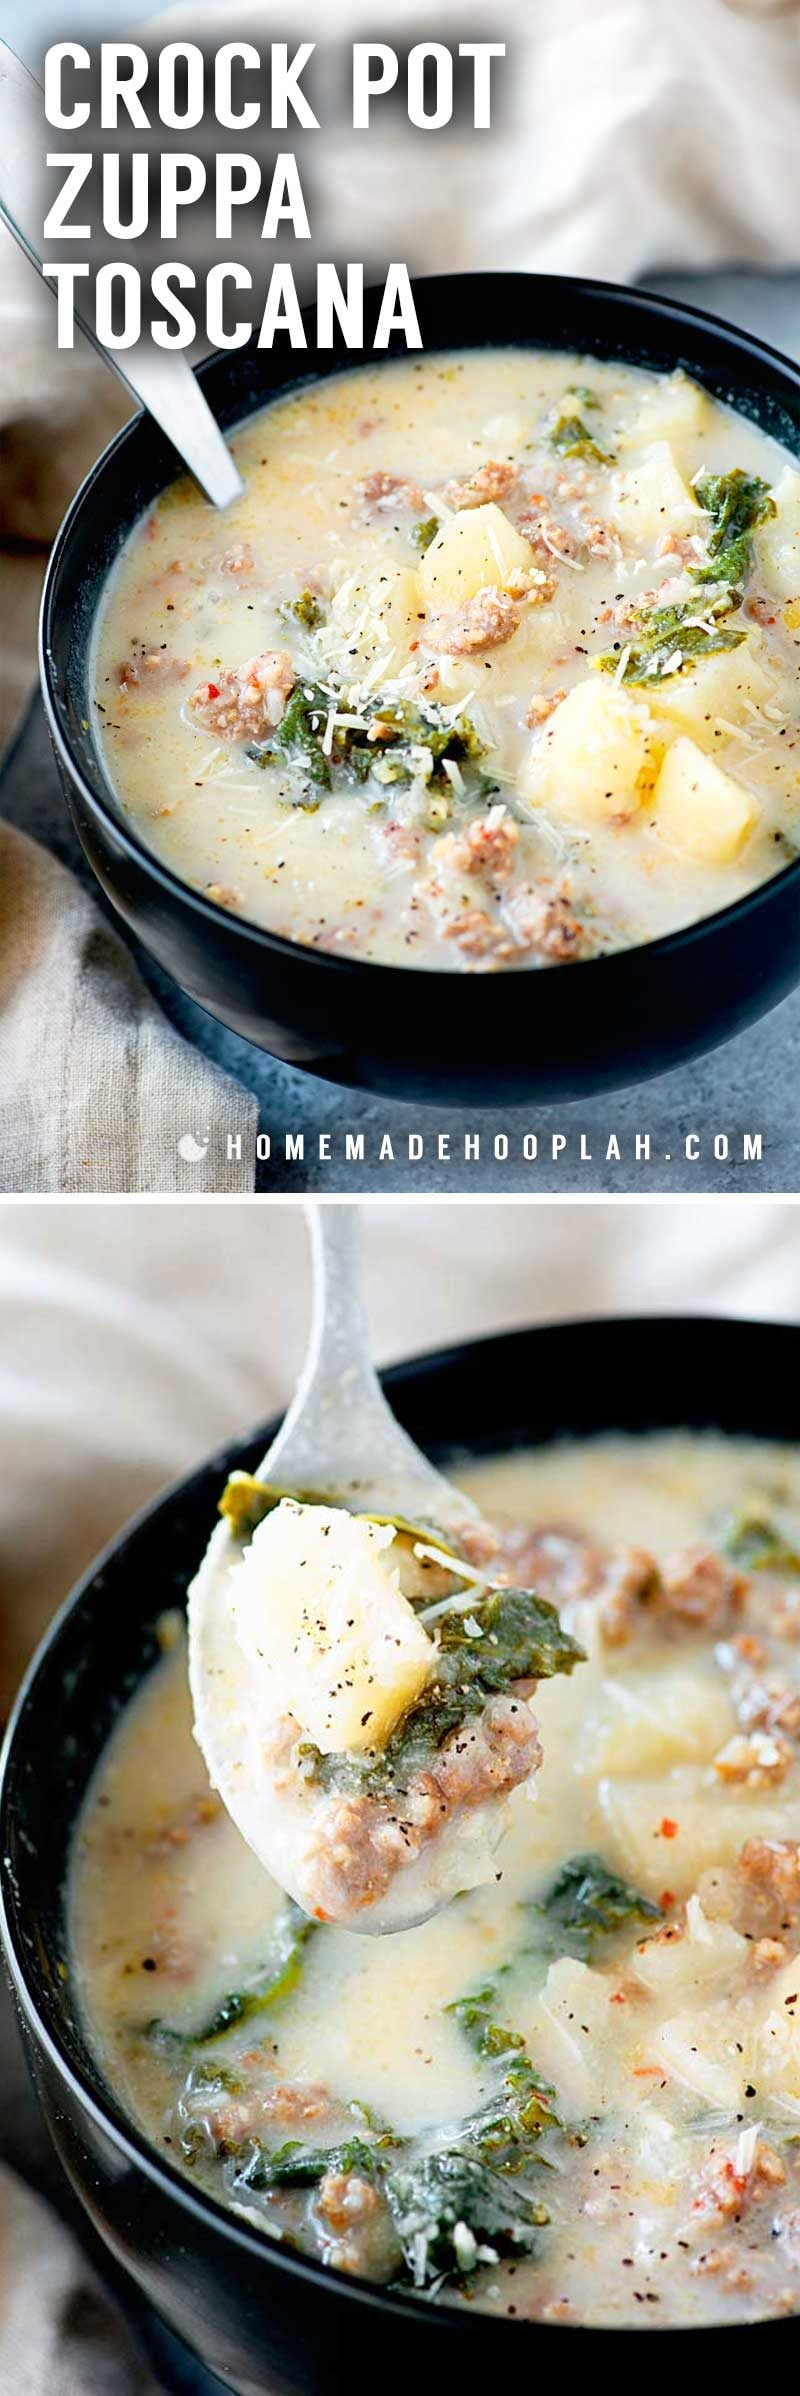 Crock Pot Zuppa Toscana - Homemade Hooplah